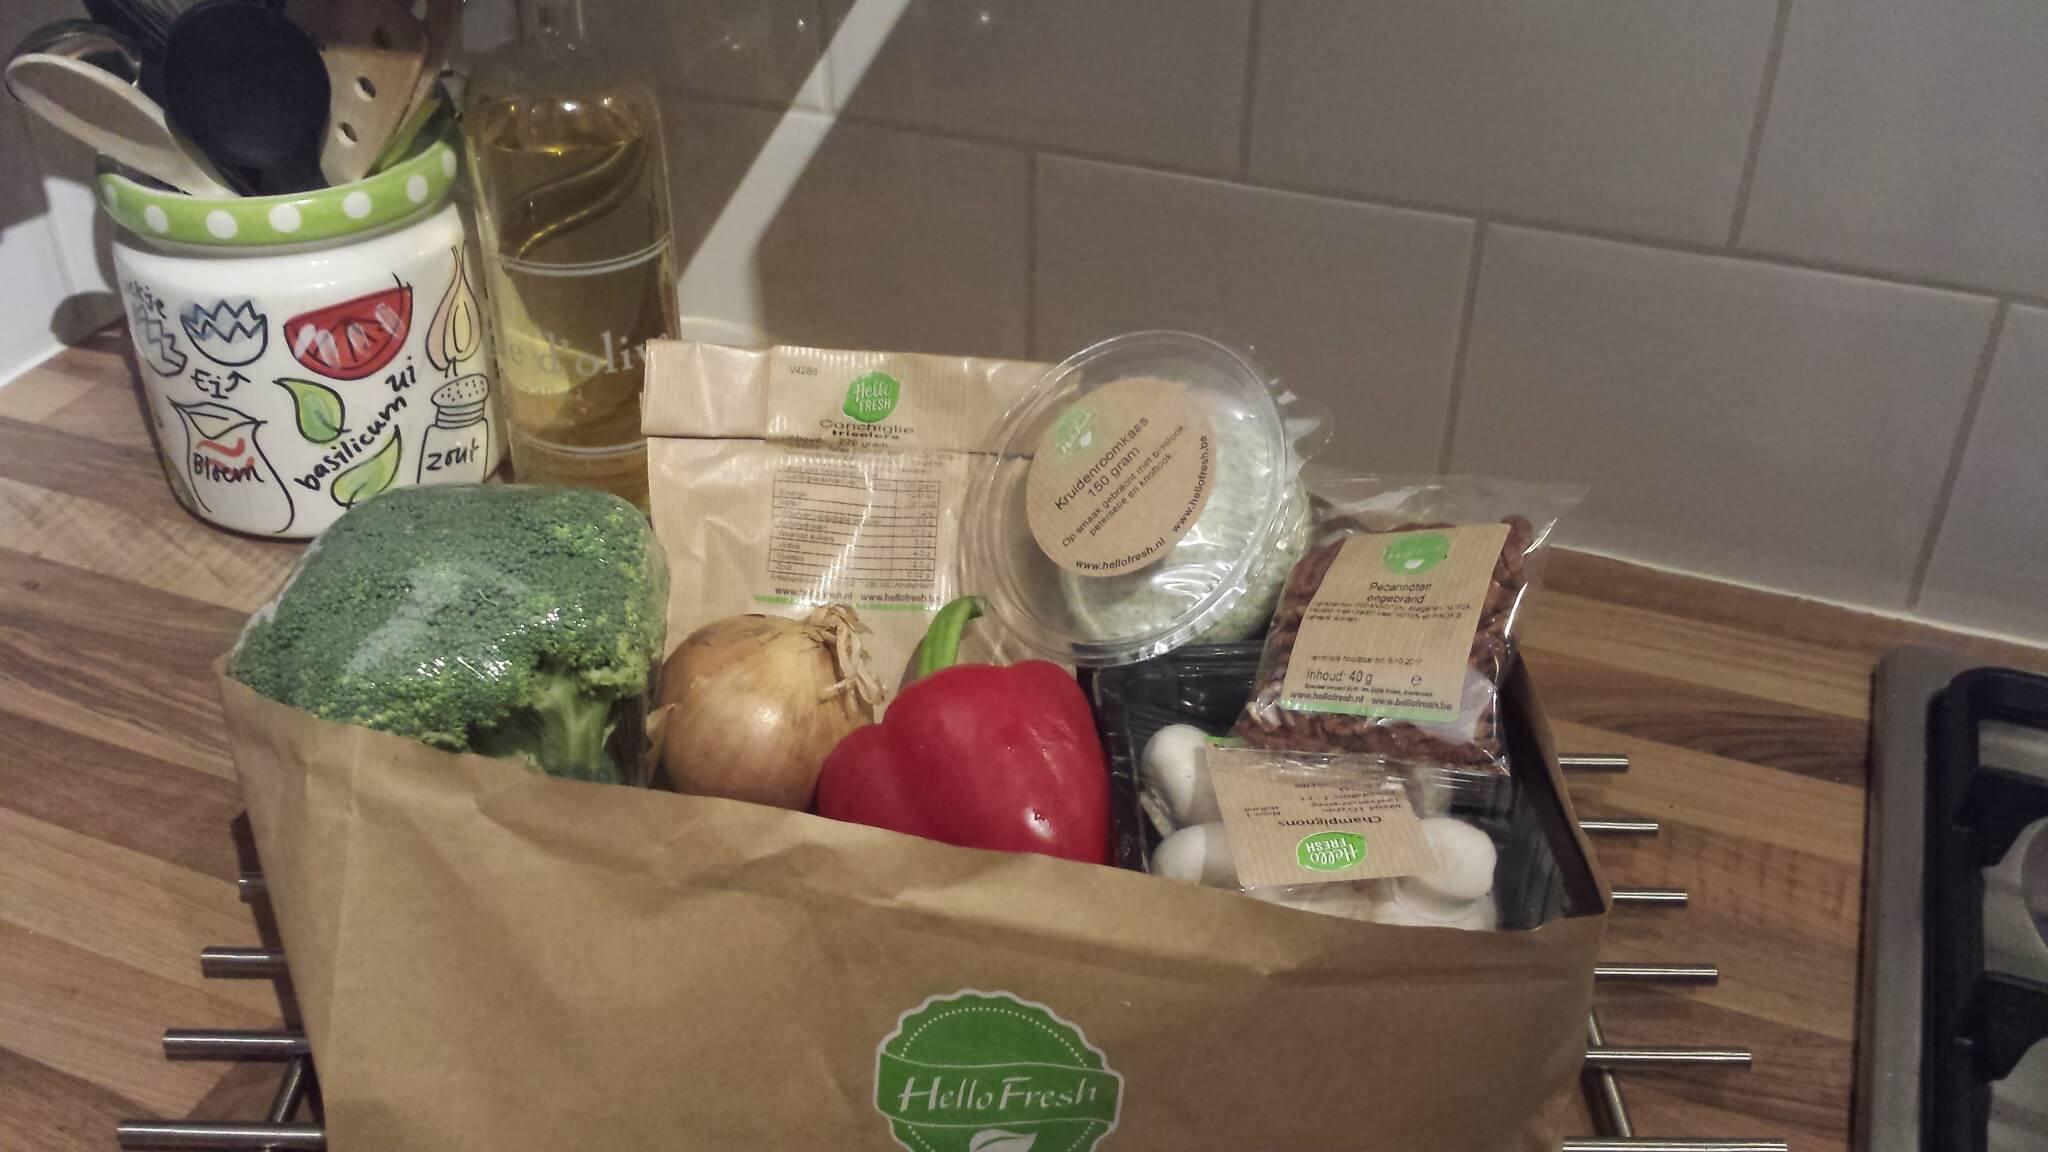 Put it to the test | De Hello Fresh box